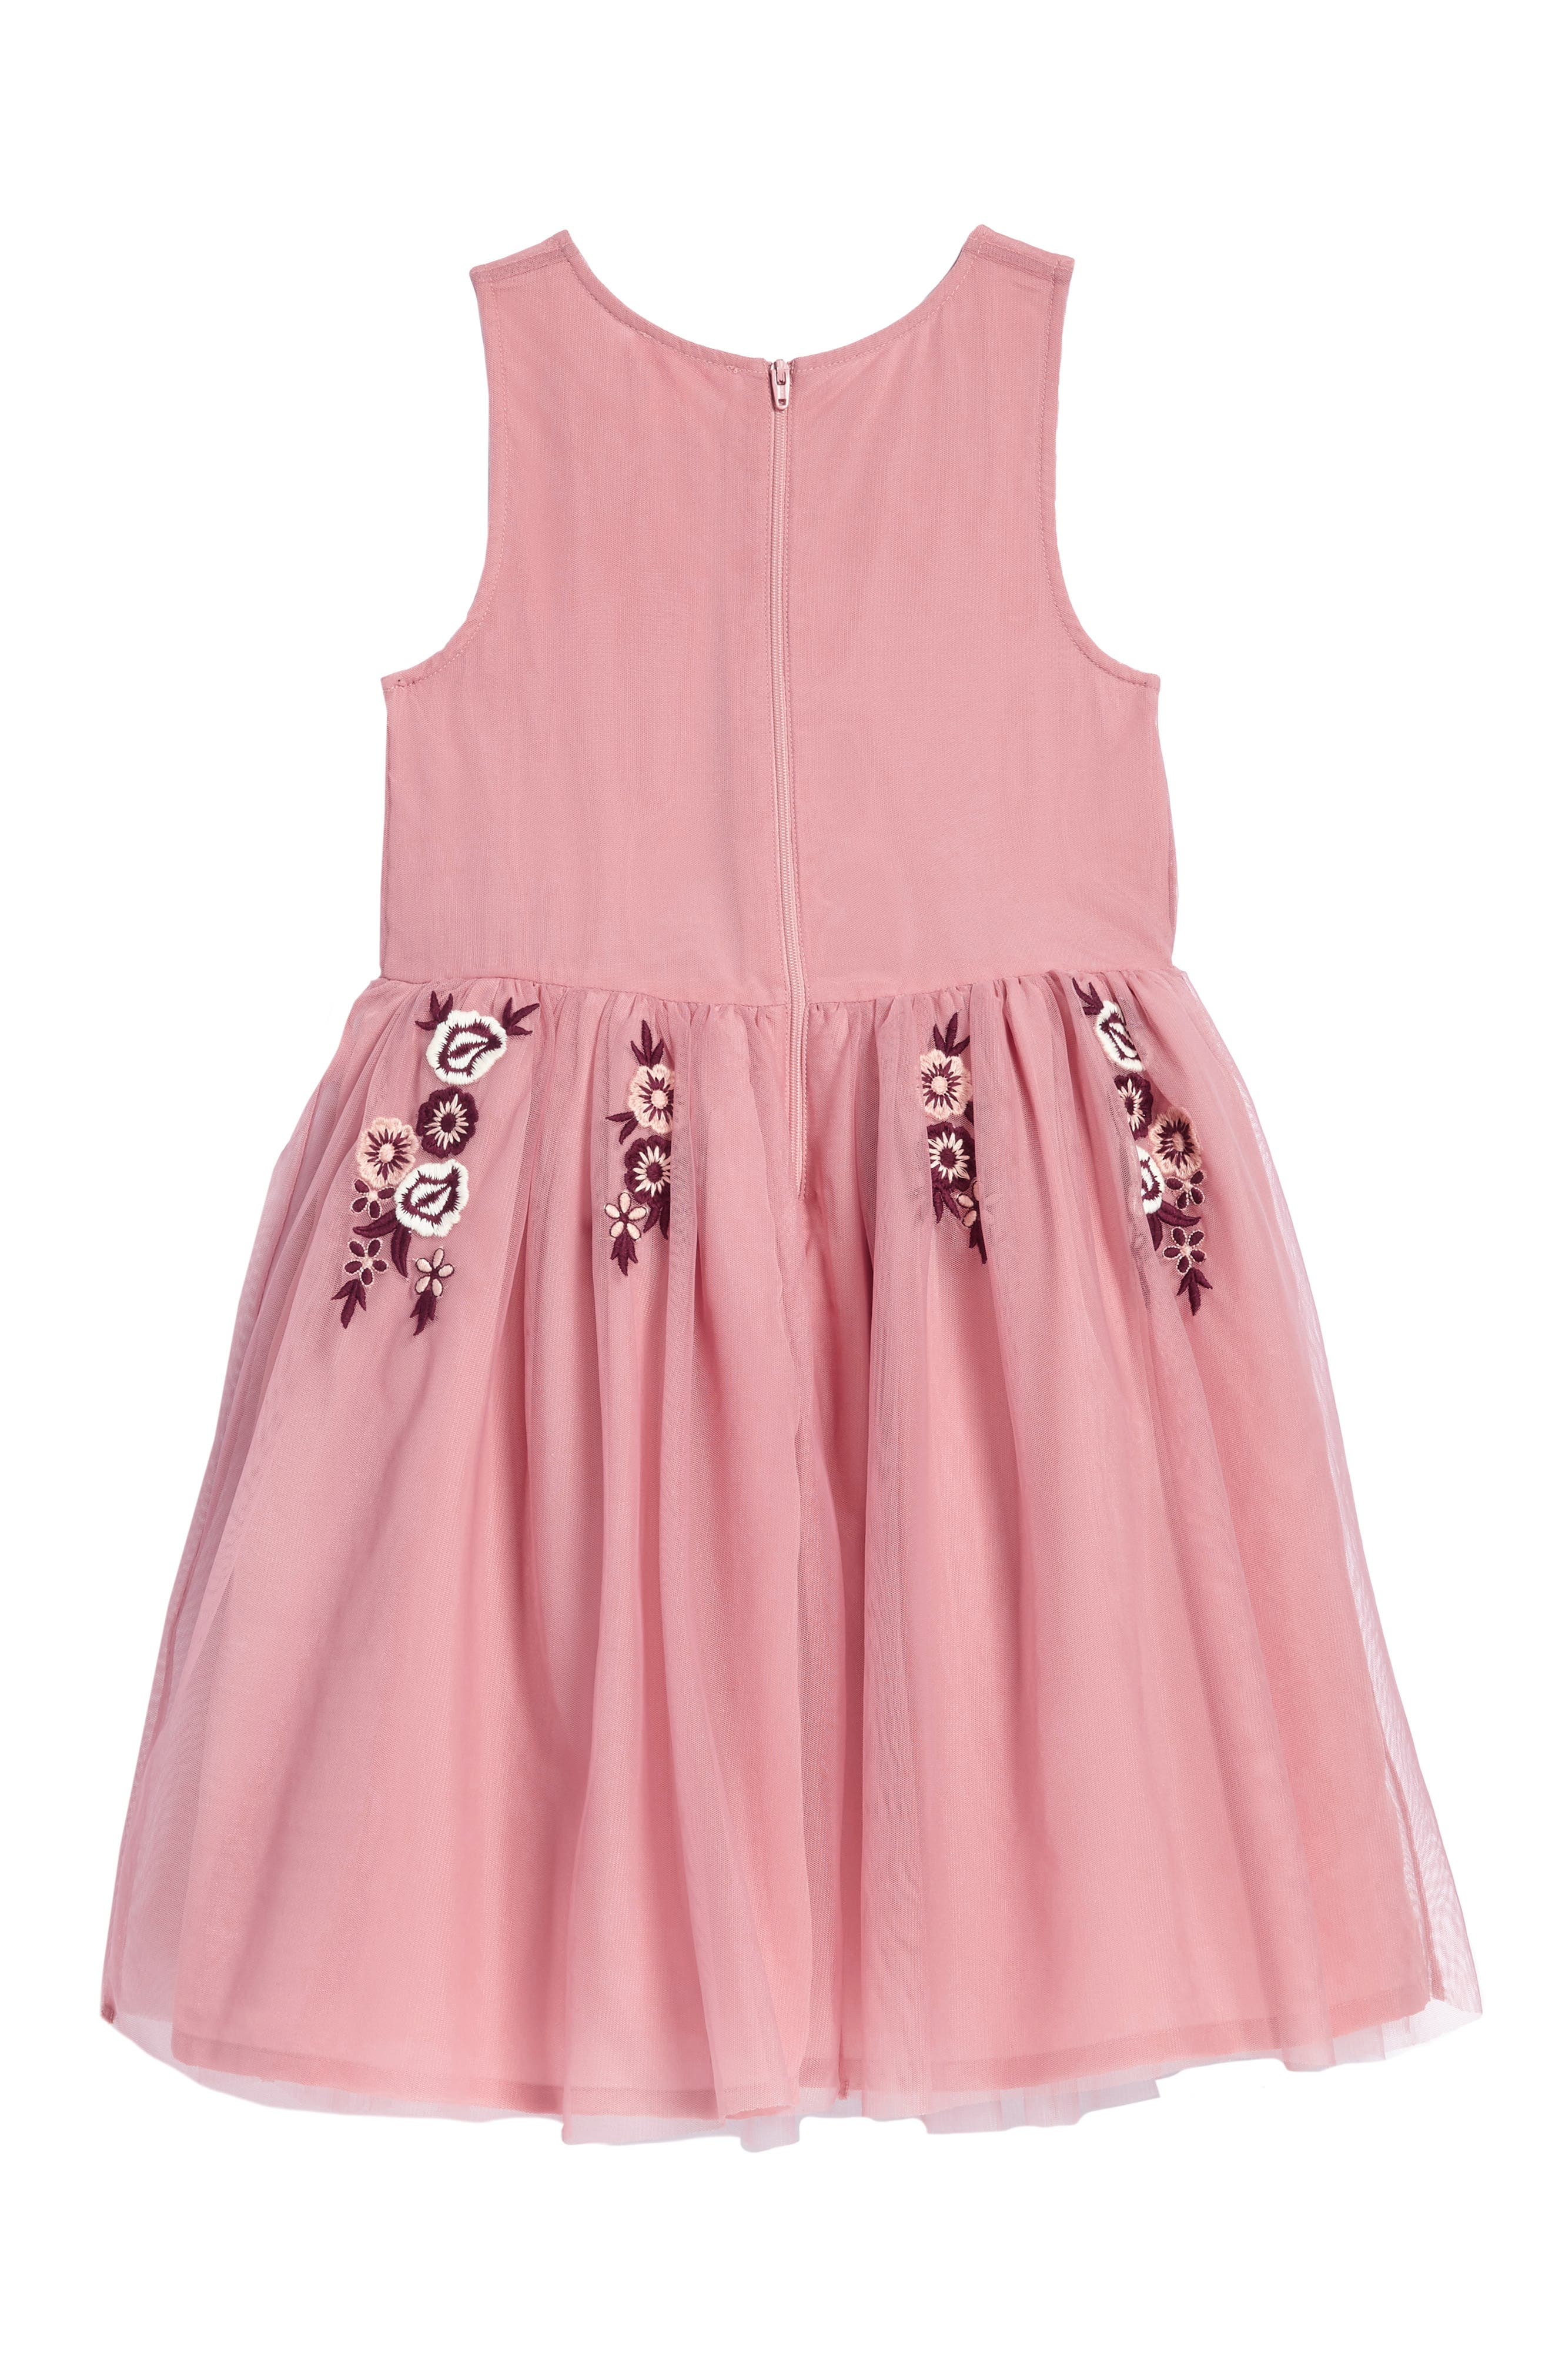 Flower Embroidered Dress,                             Alternate thumbnail 2, color,                             Pink Nostalgia